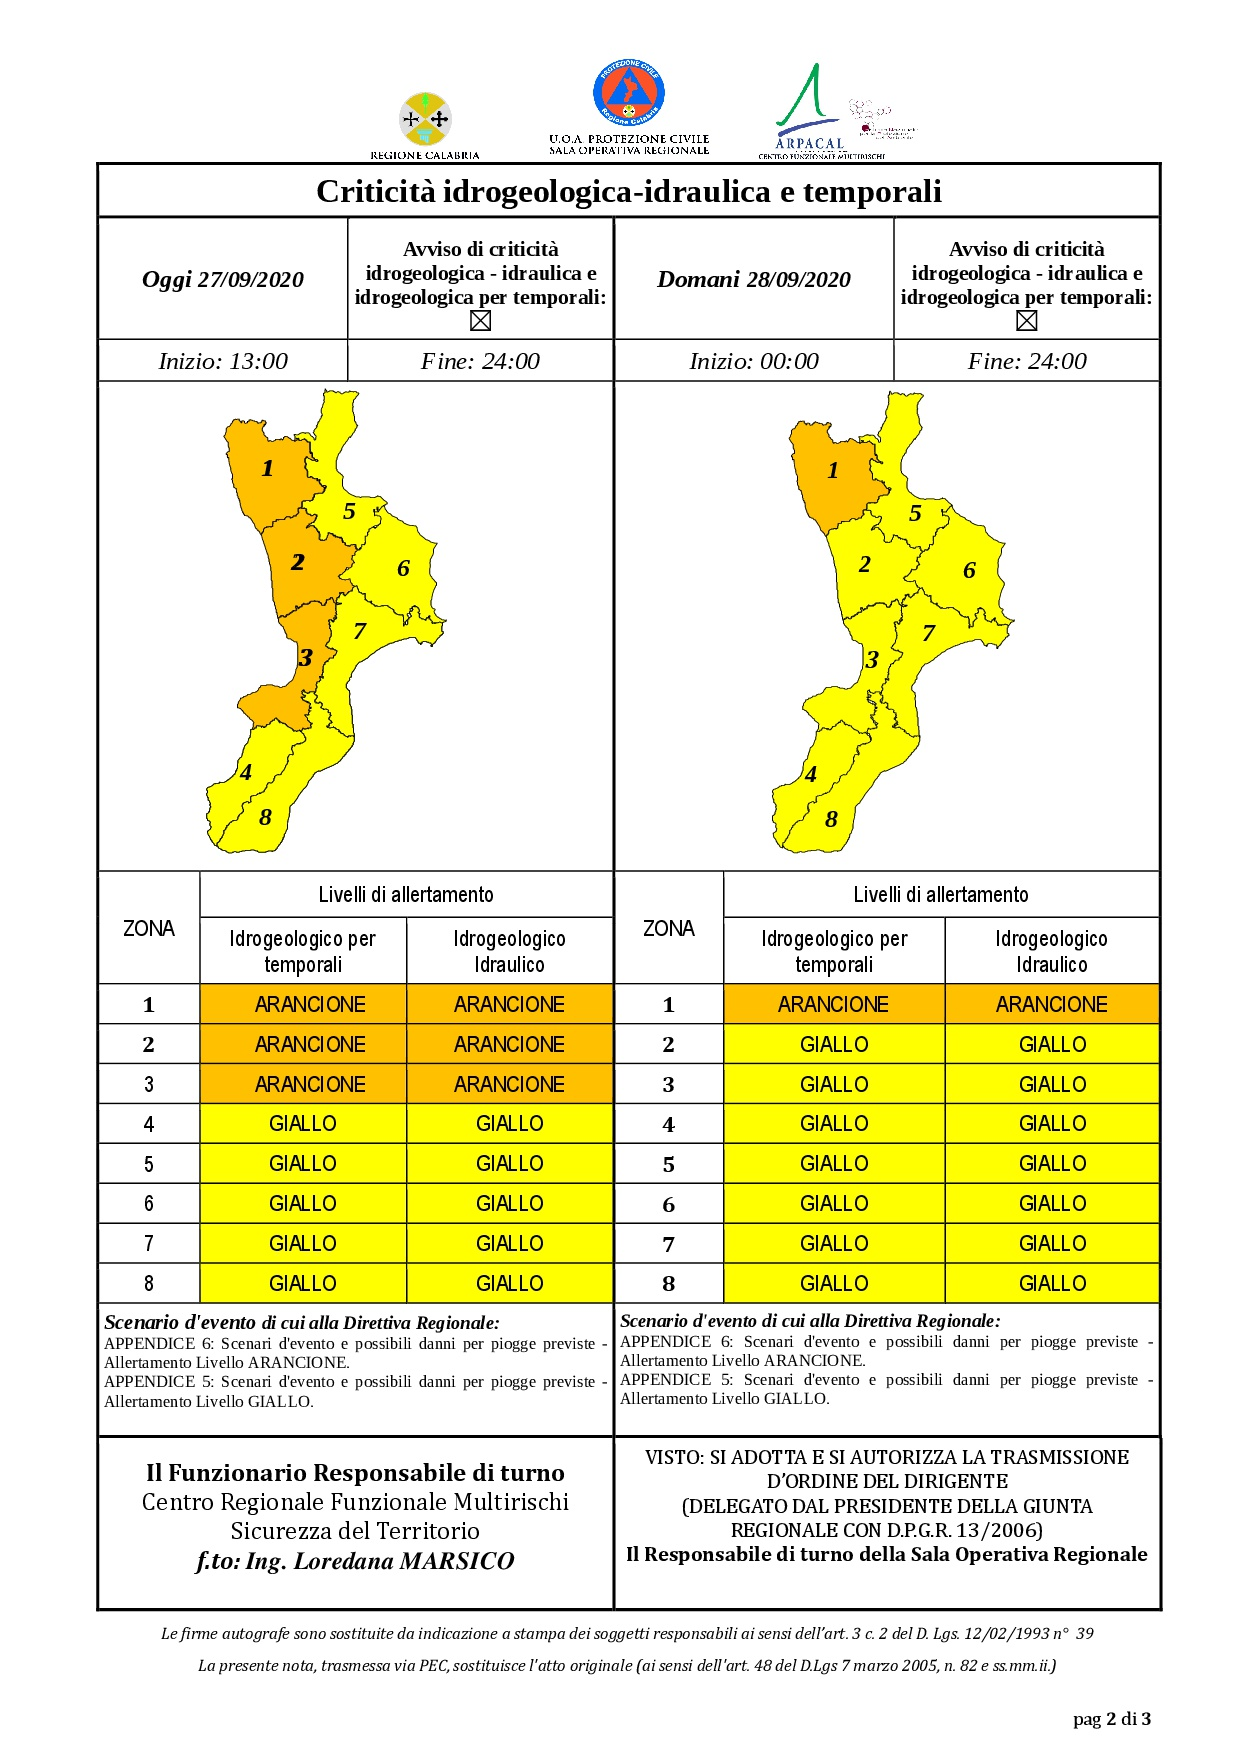 Criticità idrogeologica-idraulica e temporali in Calabria 27-09-2020